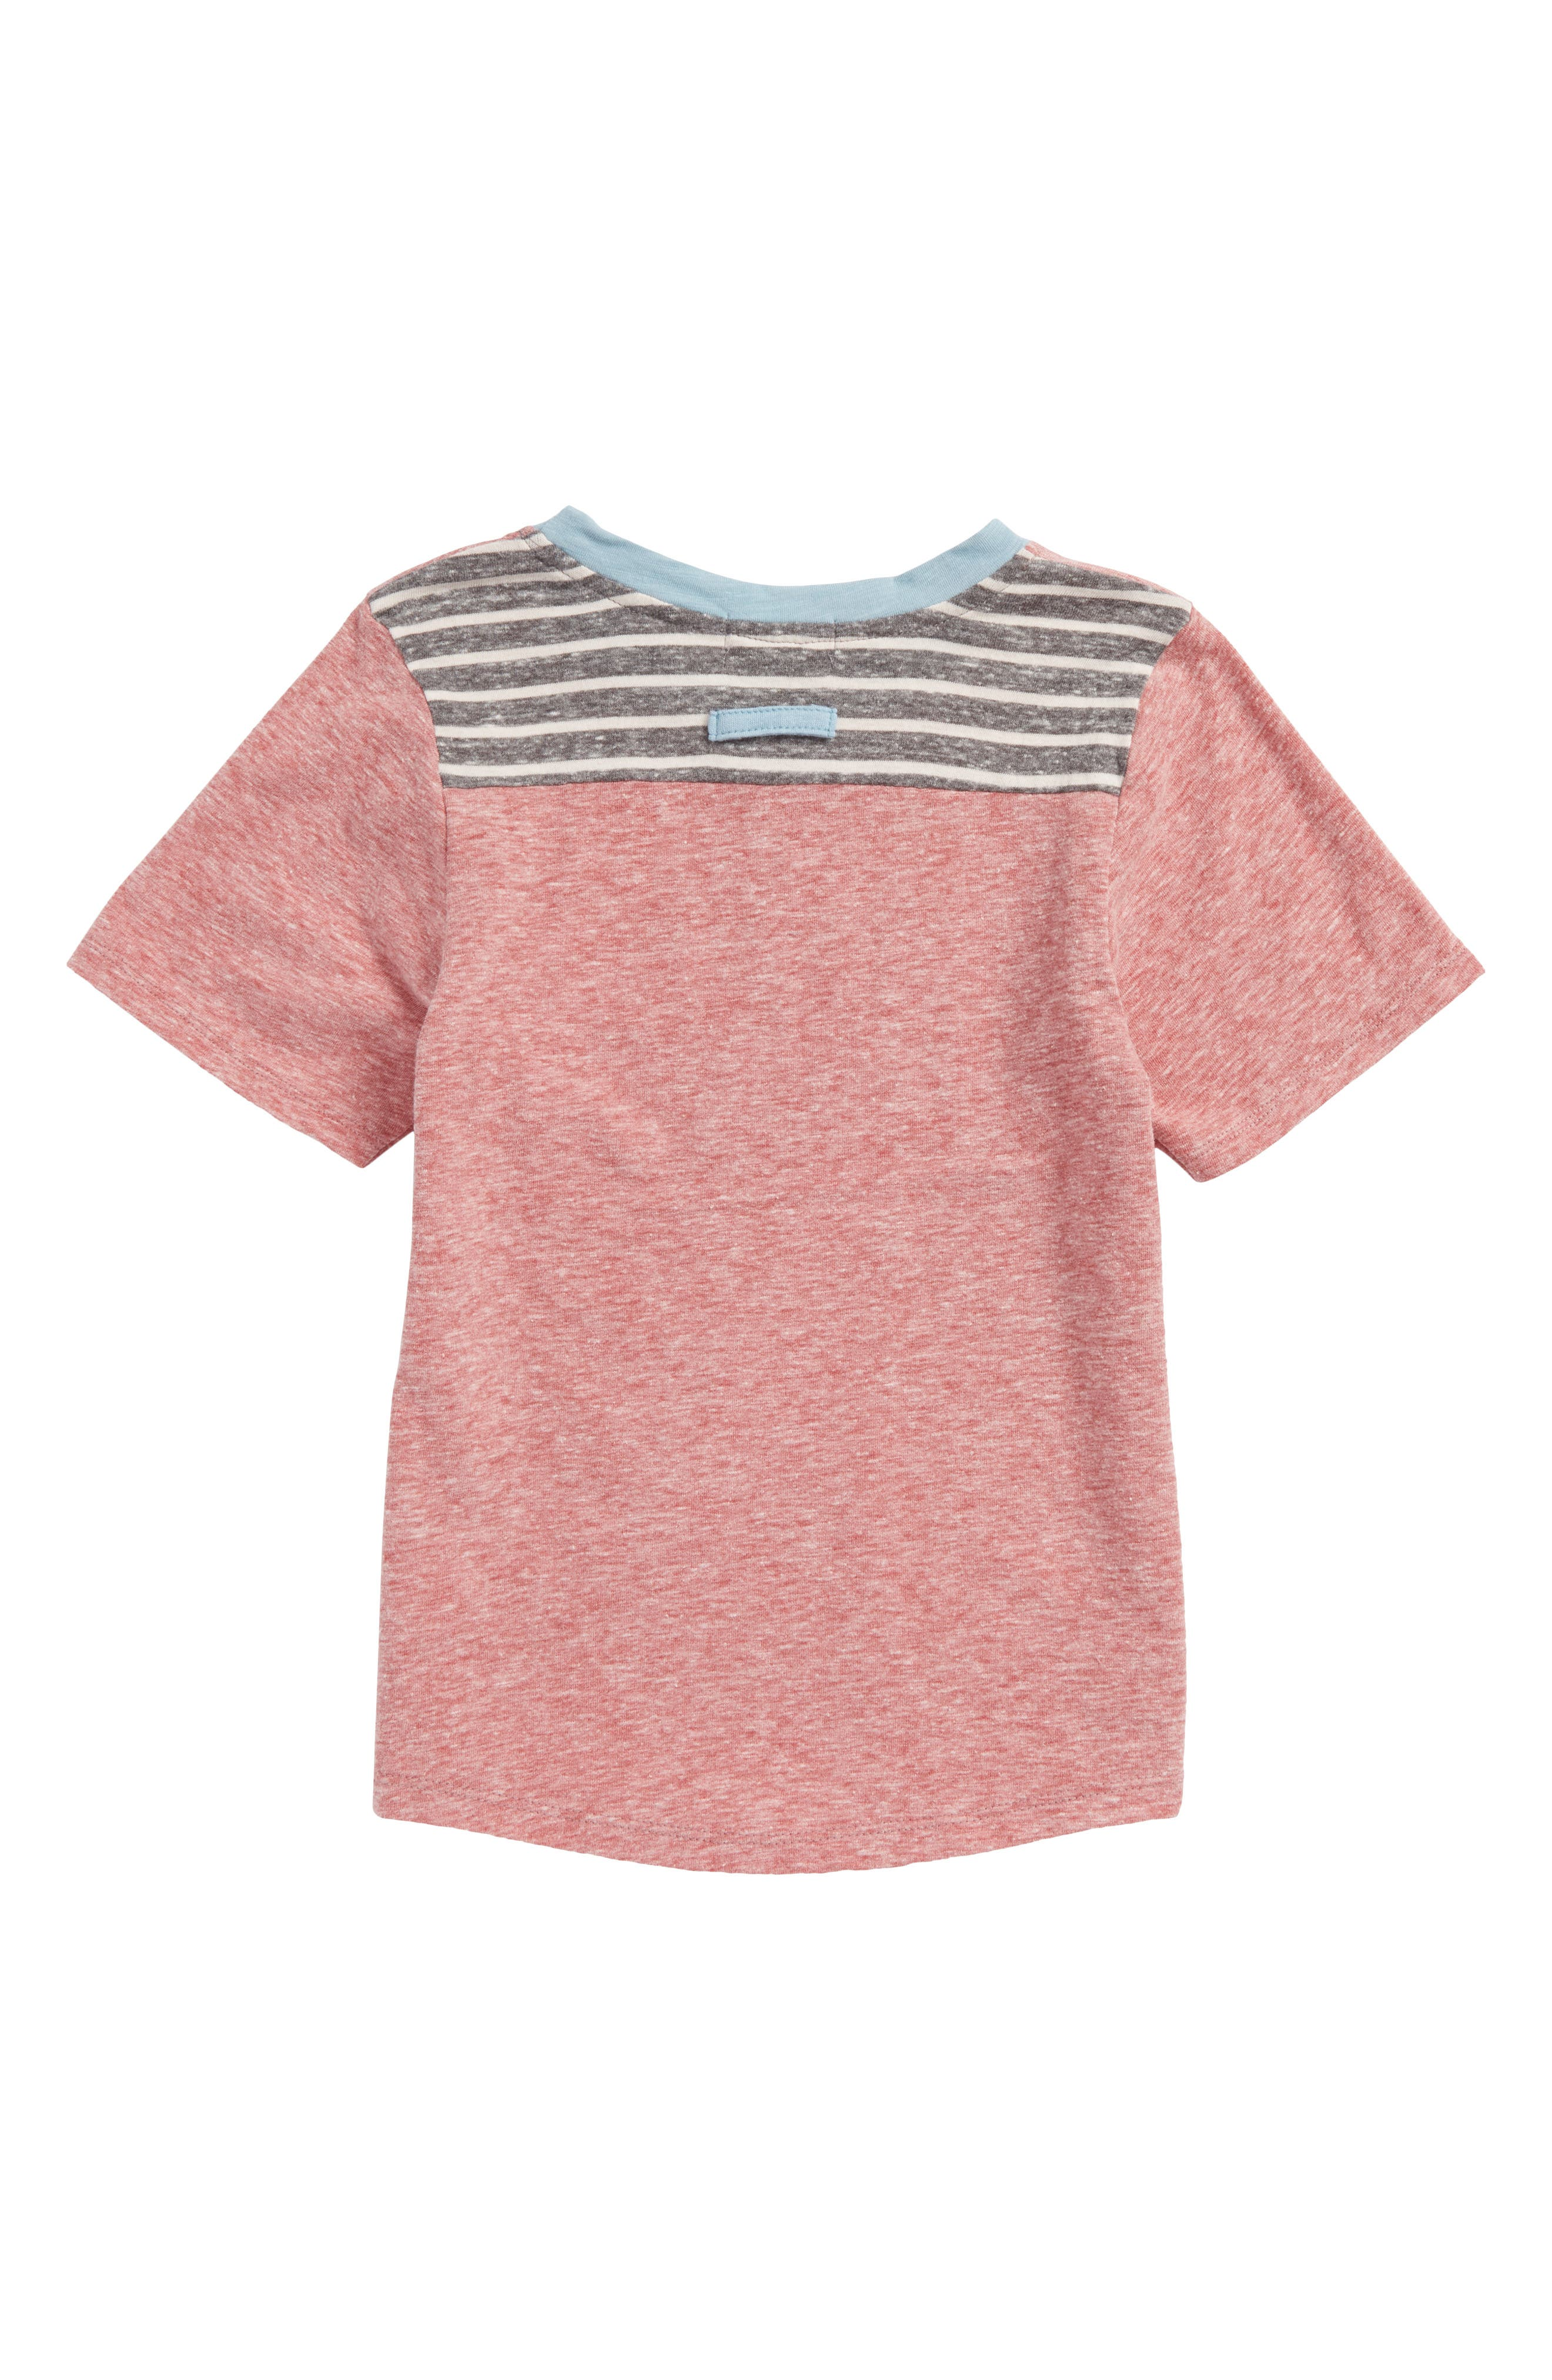 Ryker T-Shirt,                             Alternate thumbnail 2, color,                             600